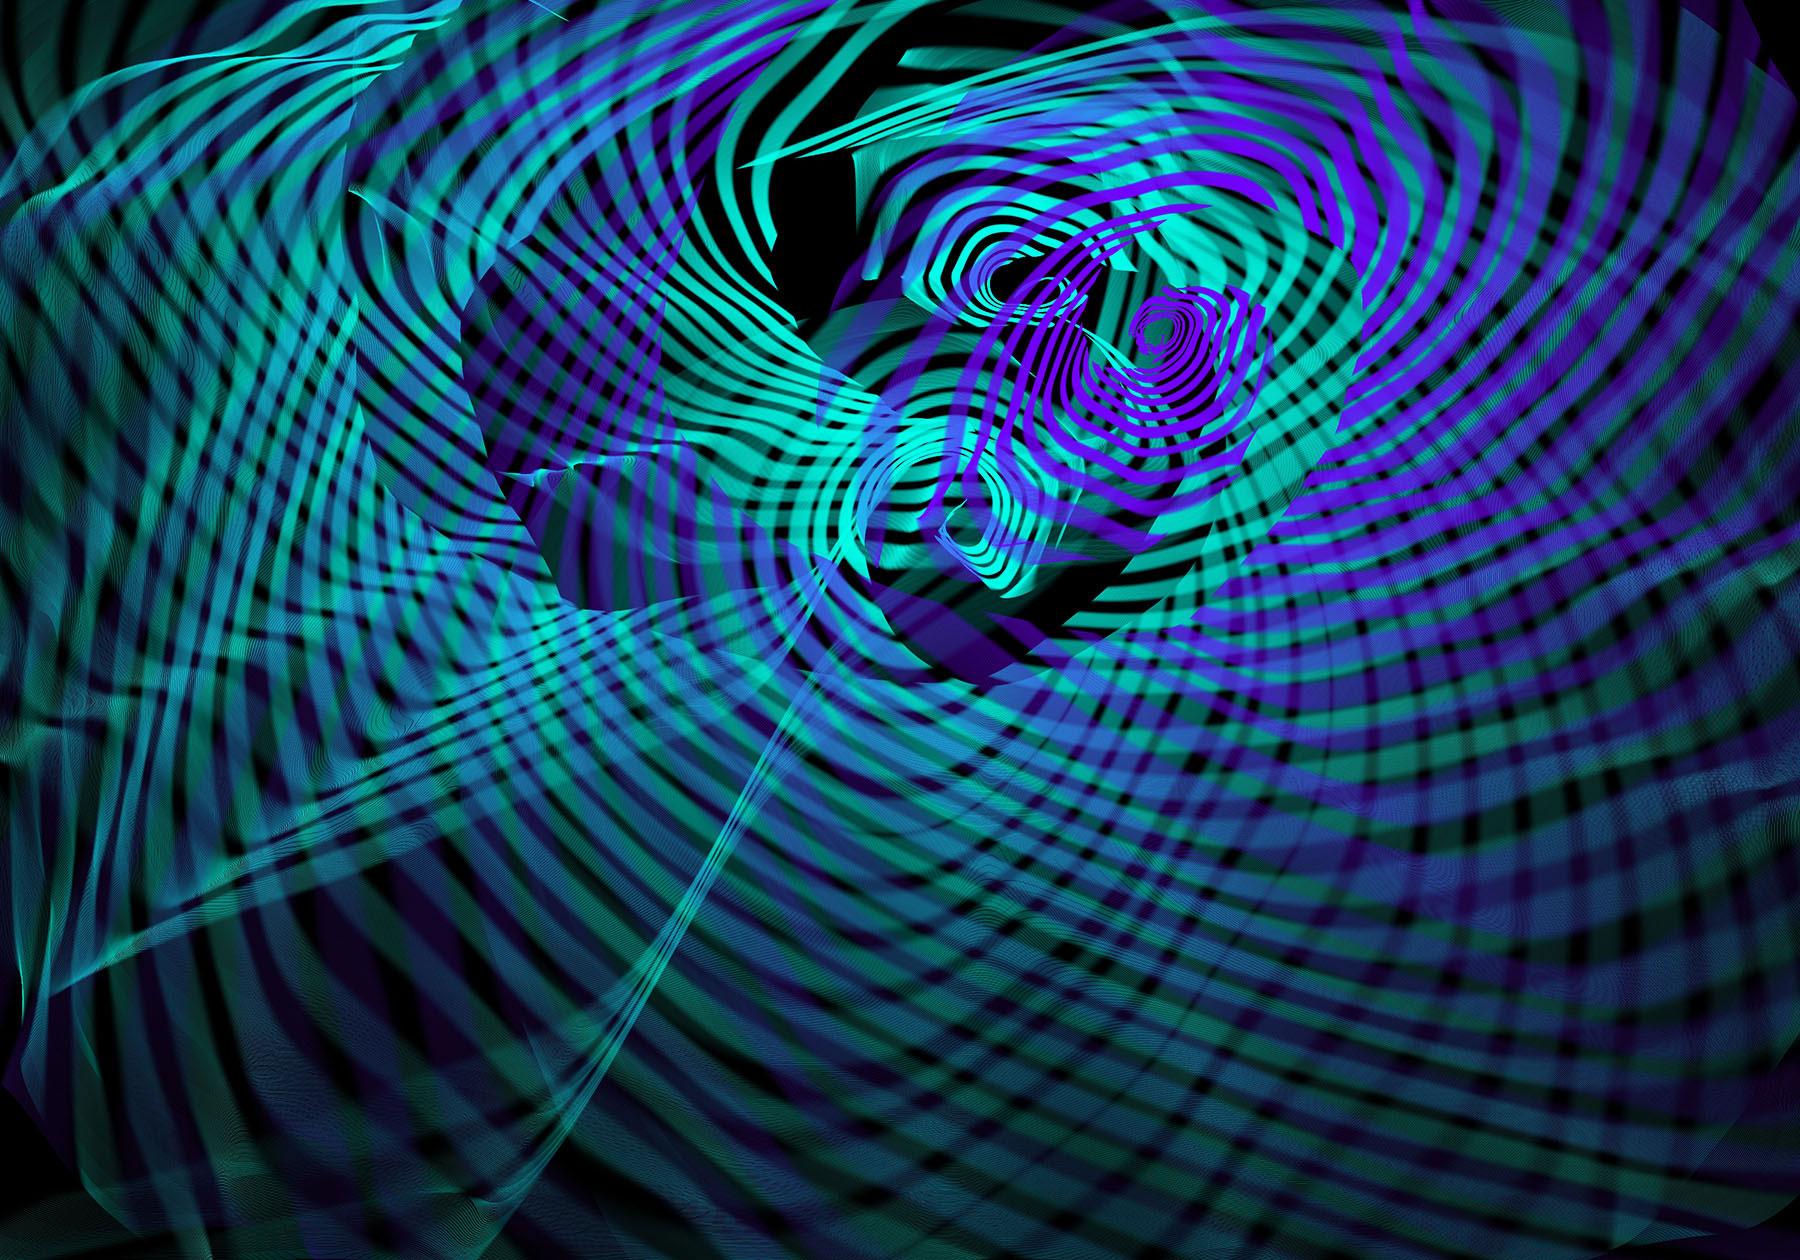 Turbulence1 by riverfox1